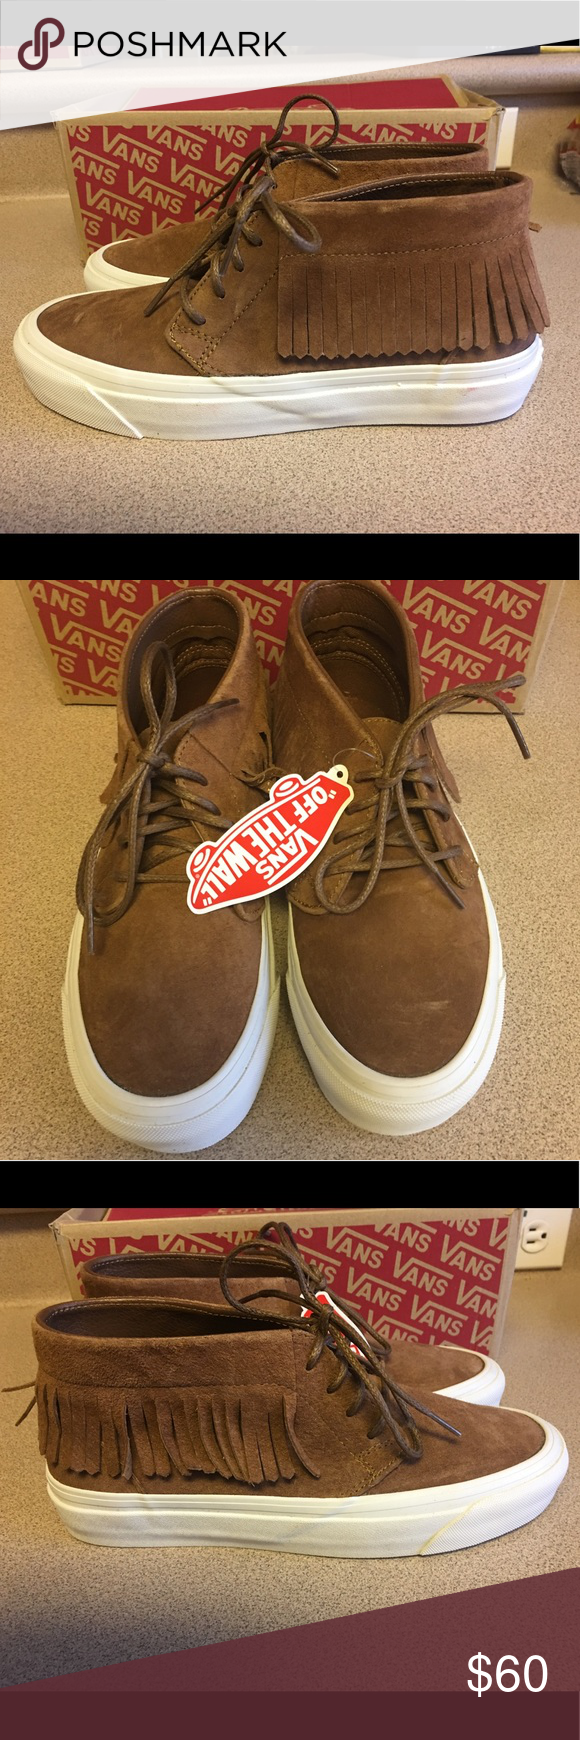 1d70f925d430 New VANS New Chukka Moc DX Suede Vault Women Sz 8 New VANS New Chukka Moc  DX Suede Vault Women s Size 8 Vans Shoes Sneakers